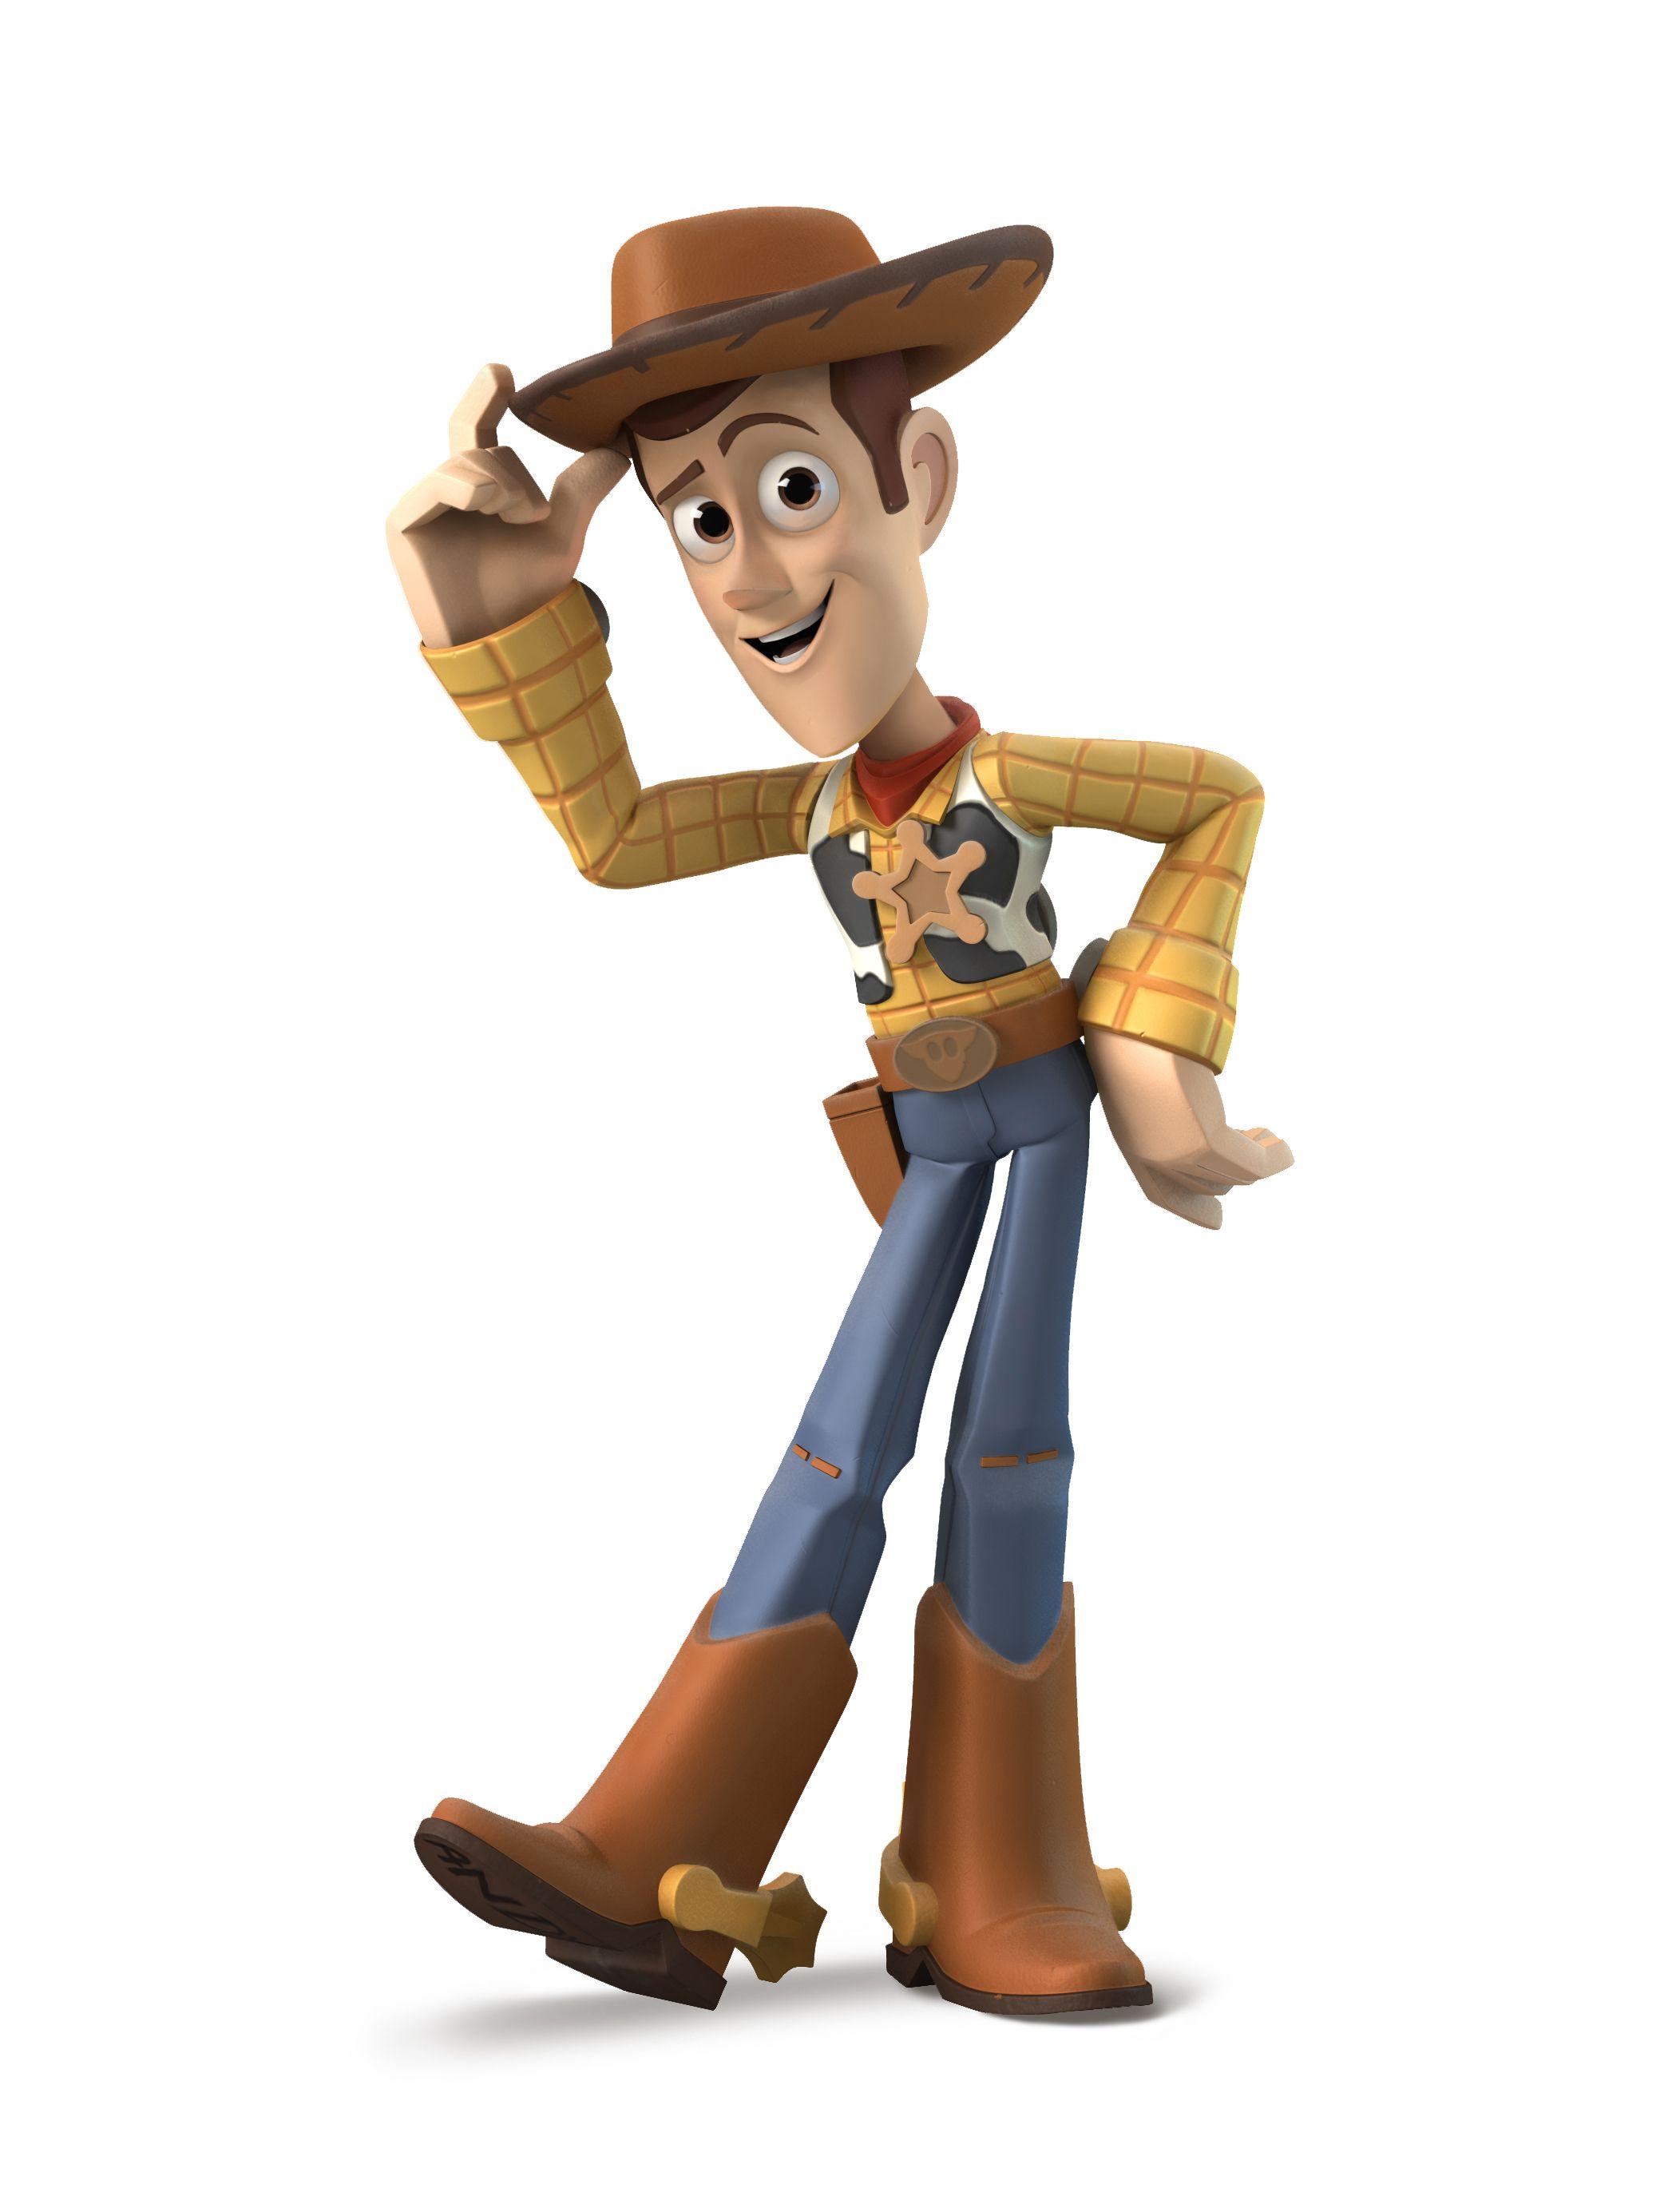 Disney Infinity Toy Story Woody